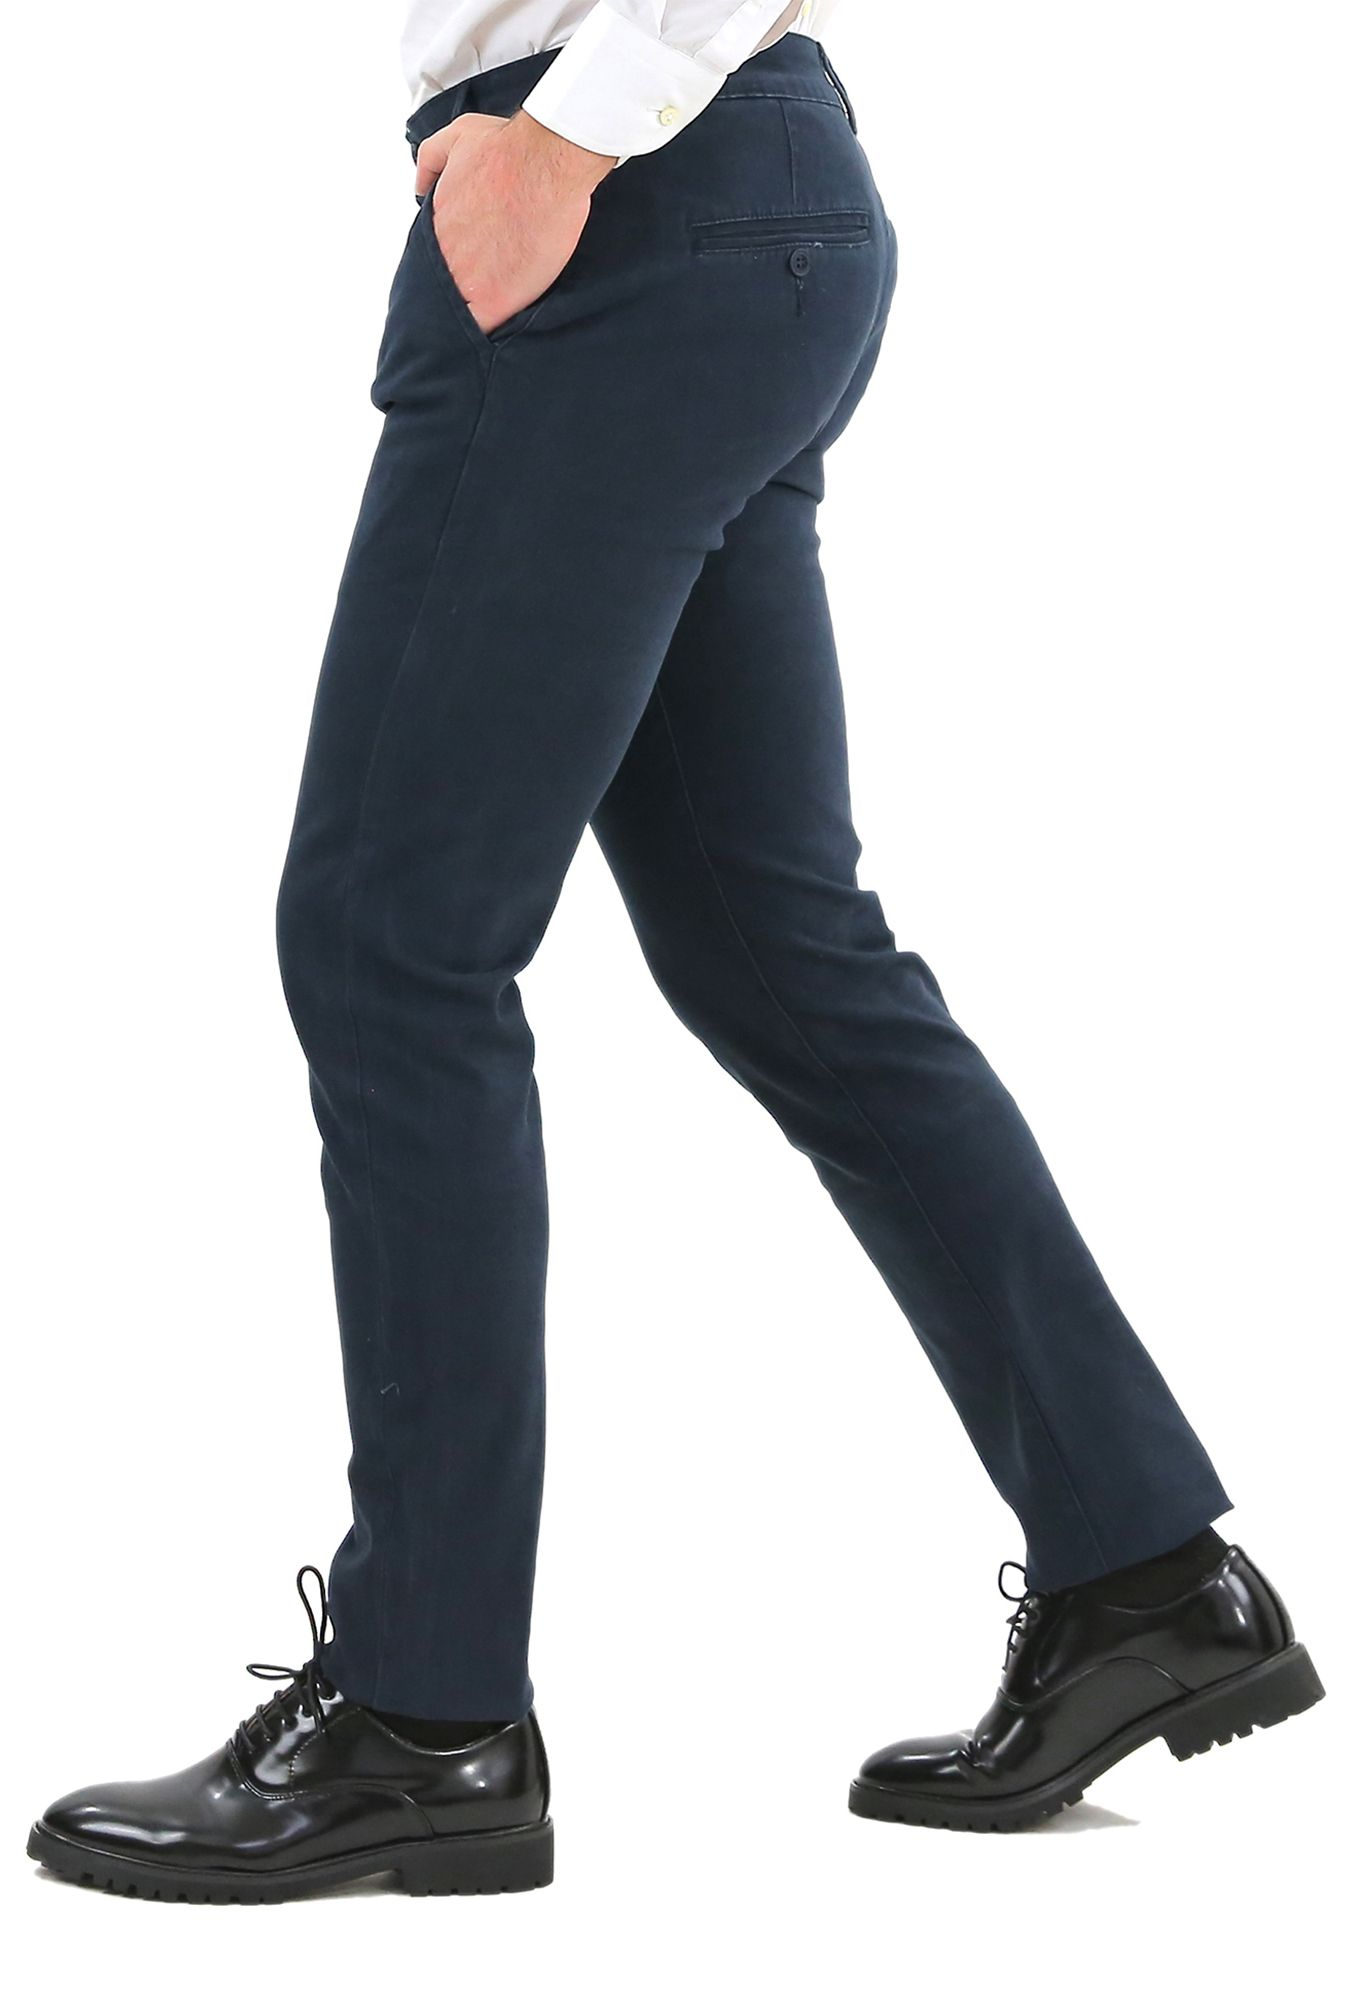 Pantaloni-Uomo-Slim-Fit-Eleganti-Invernali-Blu-Nero-Classico-Chino-Tasca-America miniatura 3